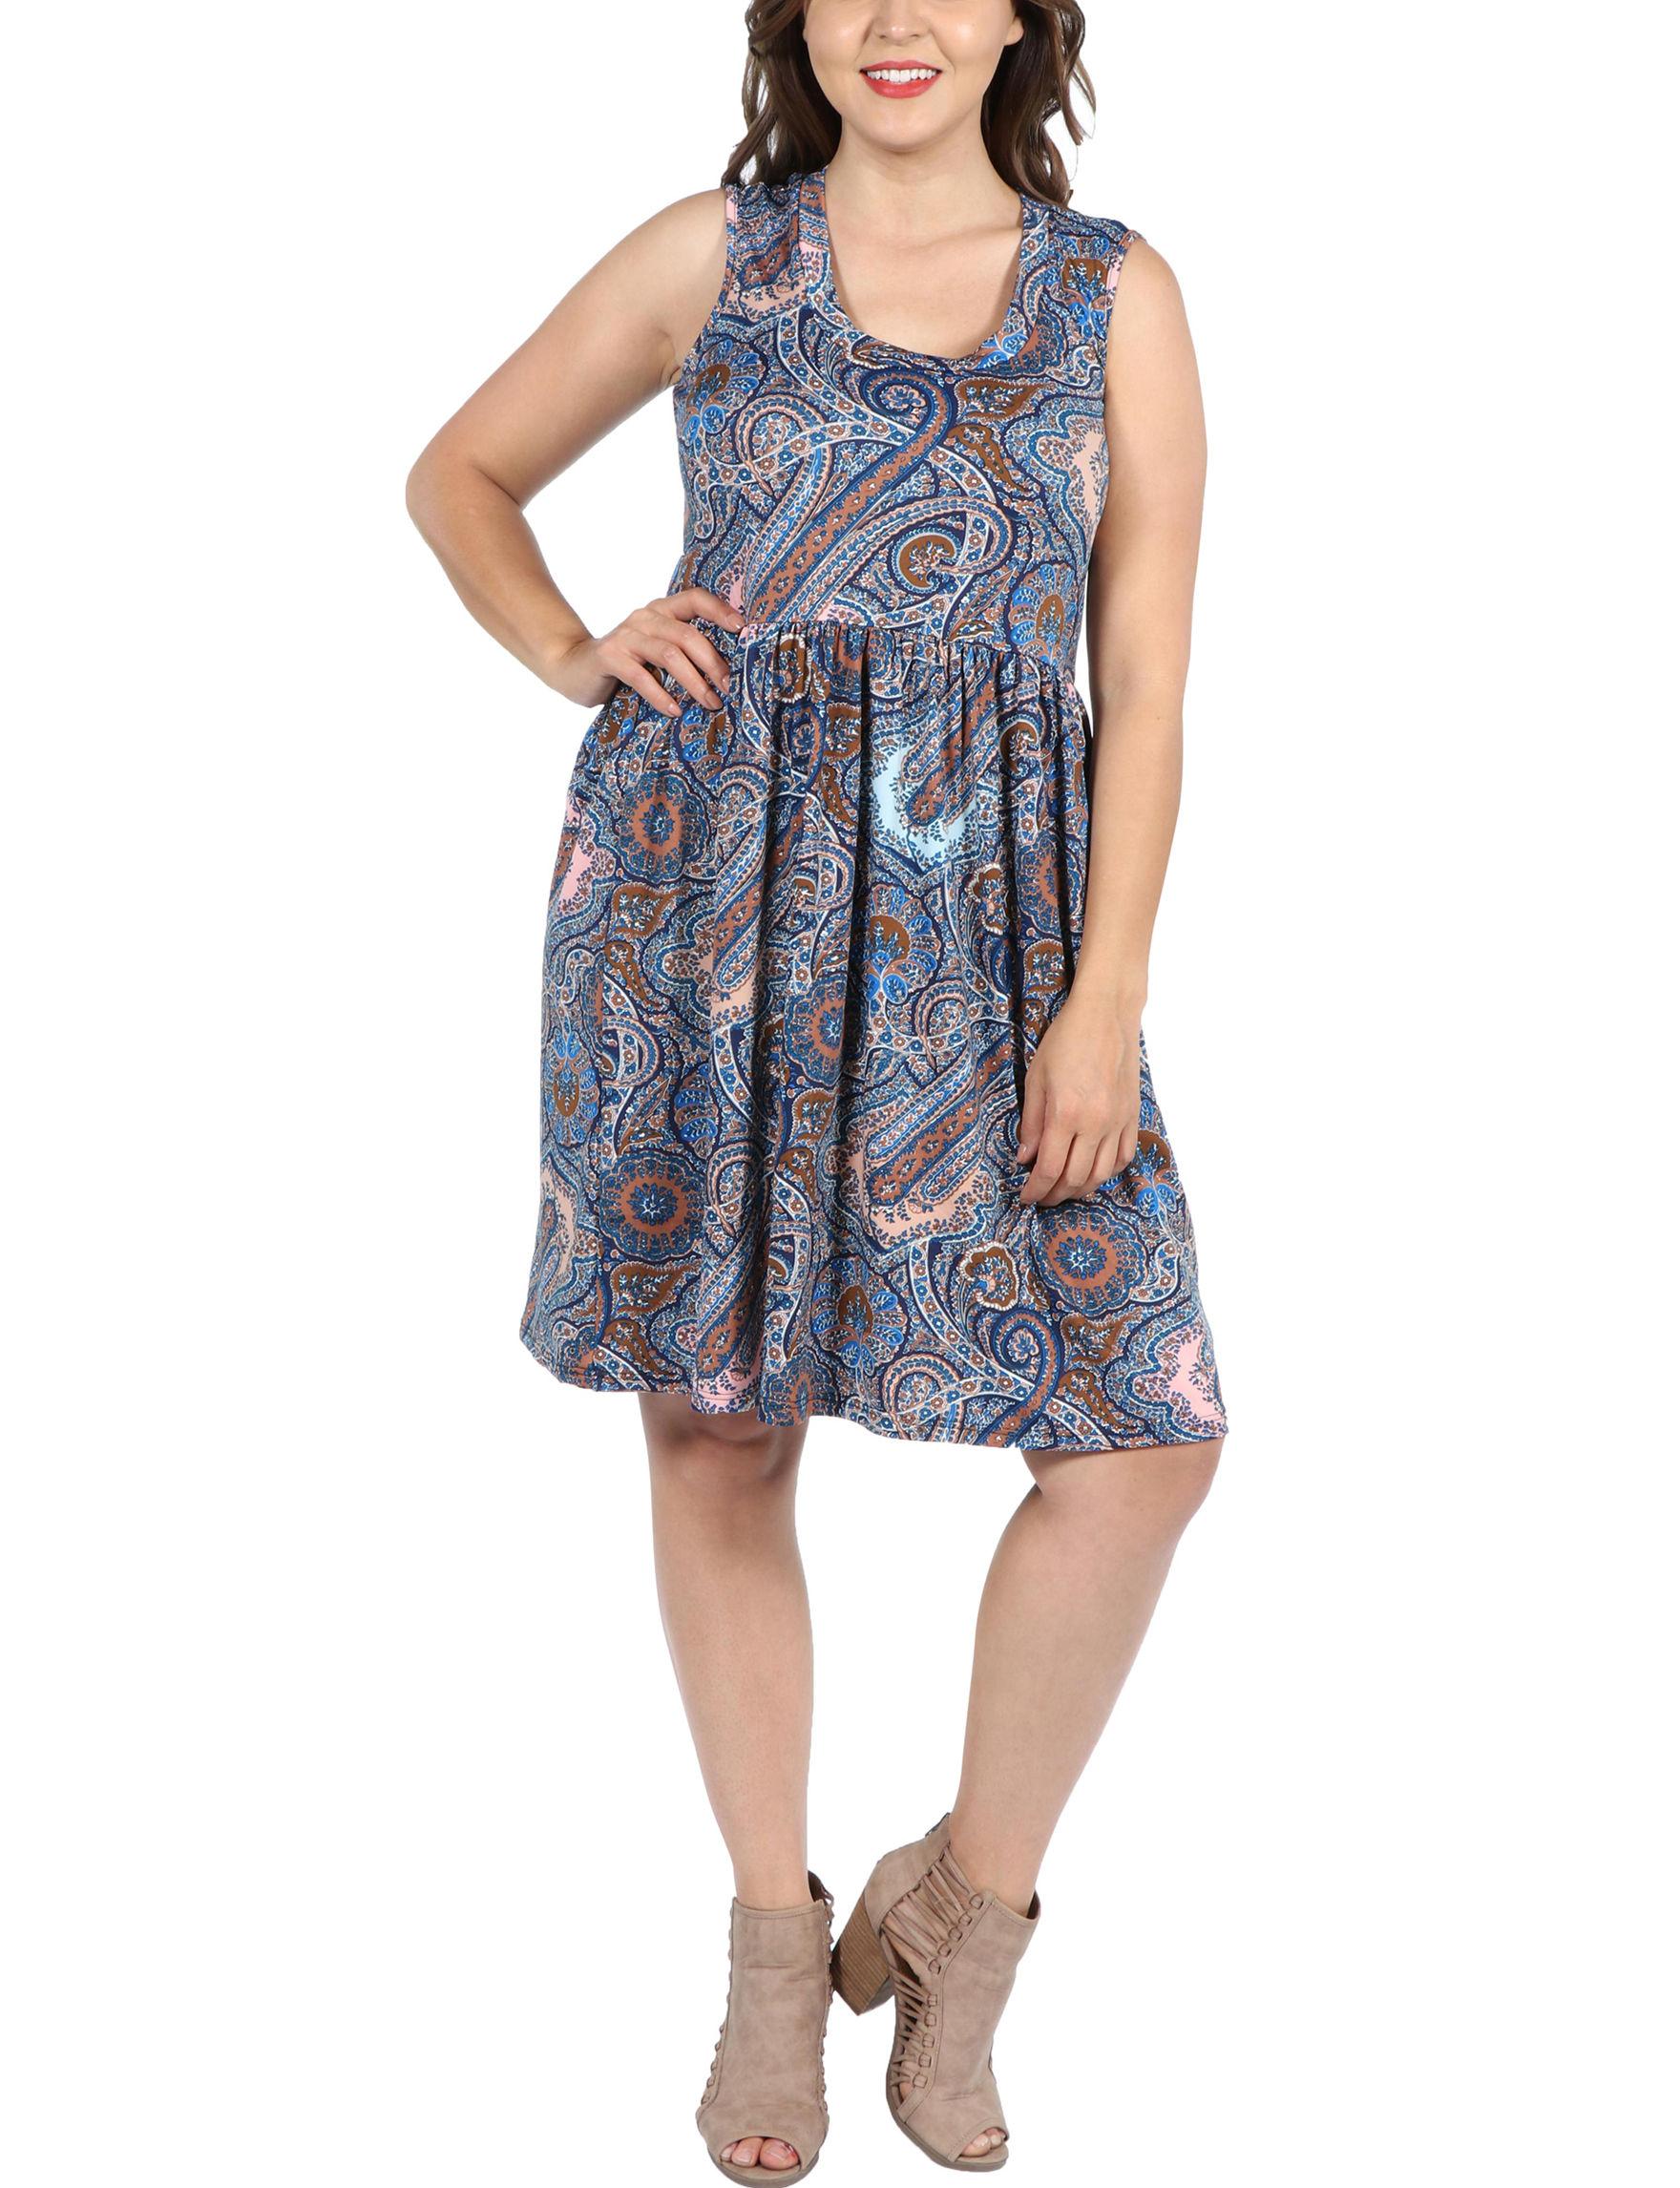 24Seven Comfort Apparel Blue Multi Everyday & Casual A-line Dresses